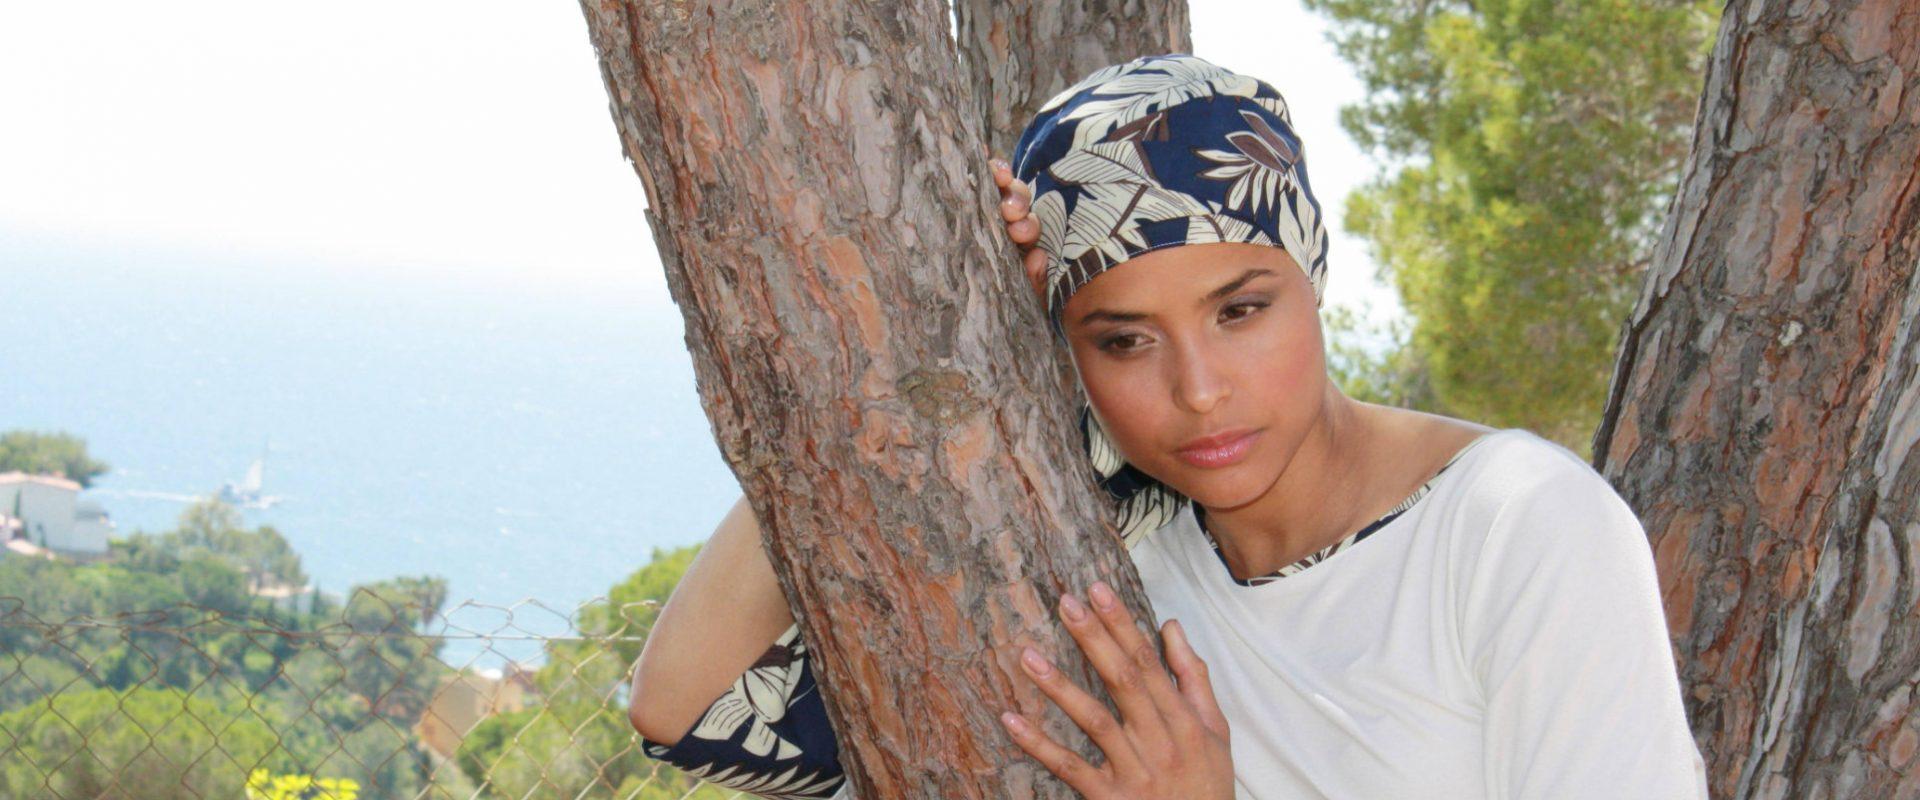 turbante oncologico  pañuelo quimio